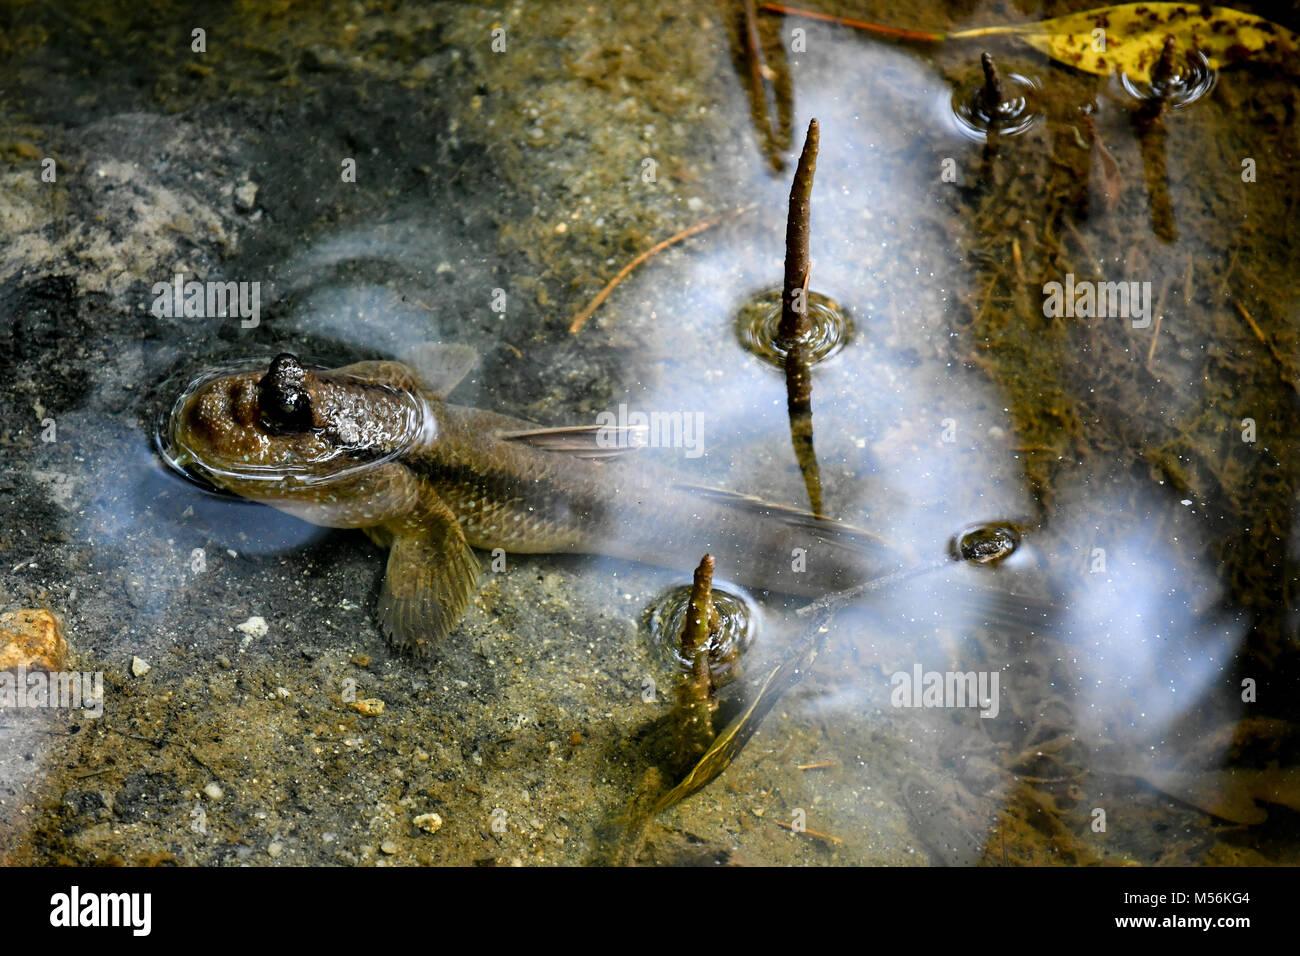 Wild Mudskipper Fish - Stock Image